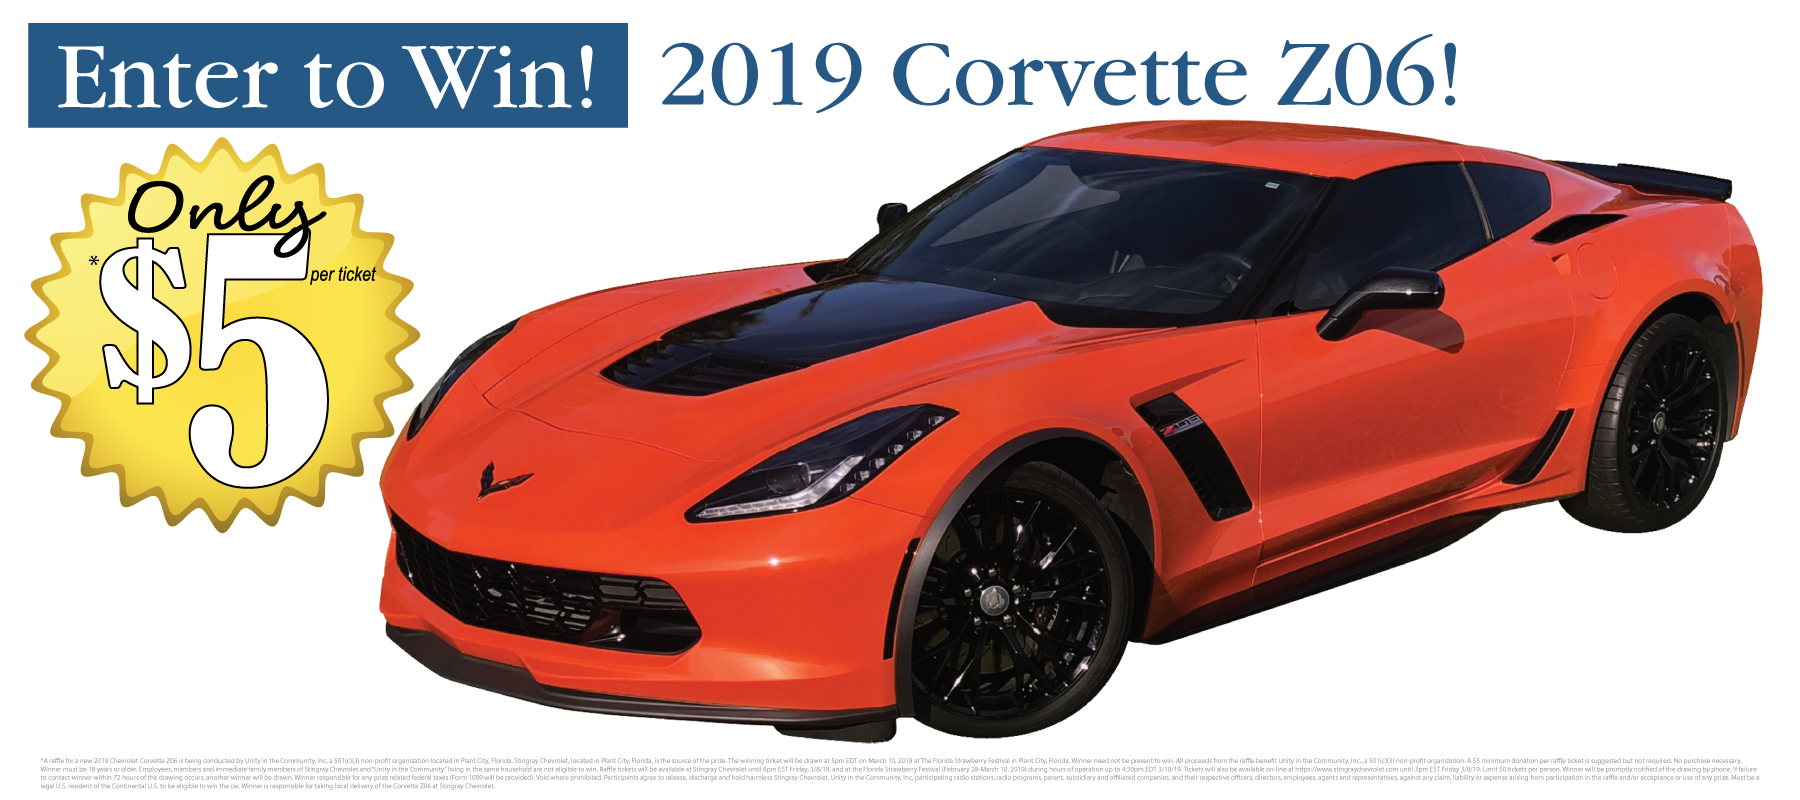 2019 Chevrolet Corvette Z06 Raffle L Plant City Fl